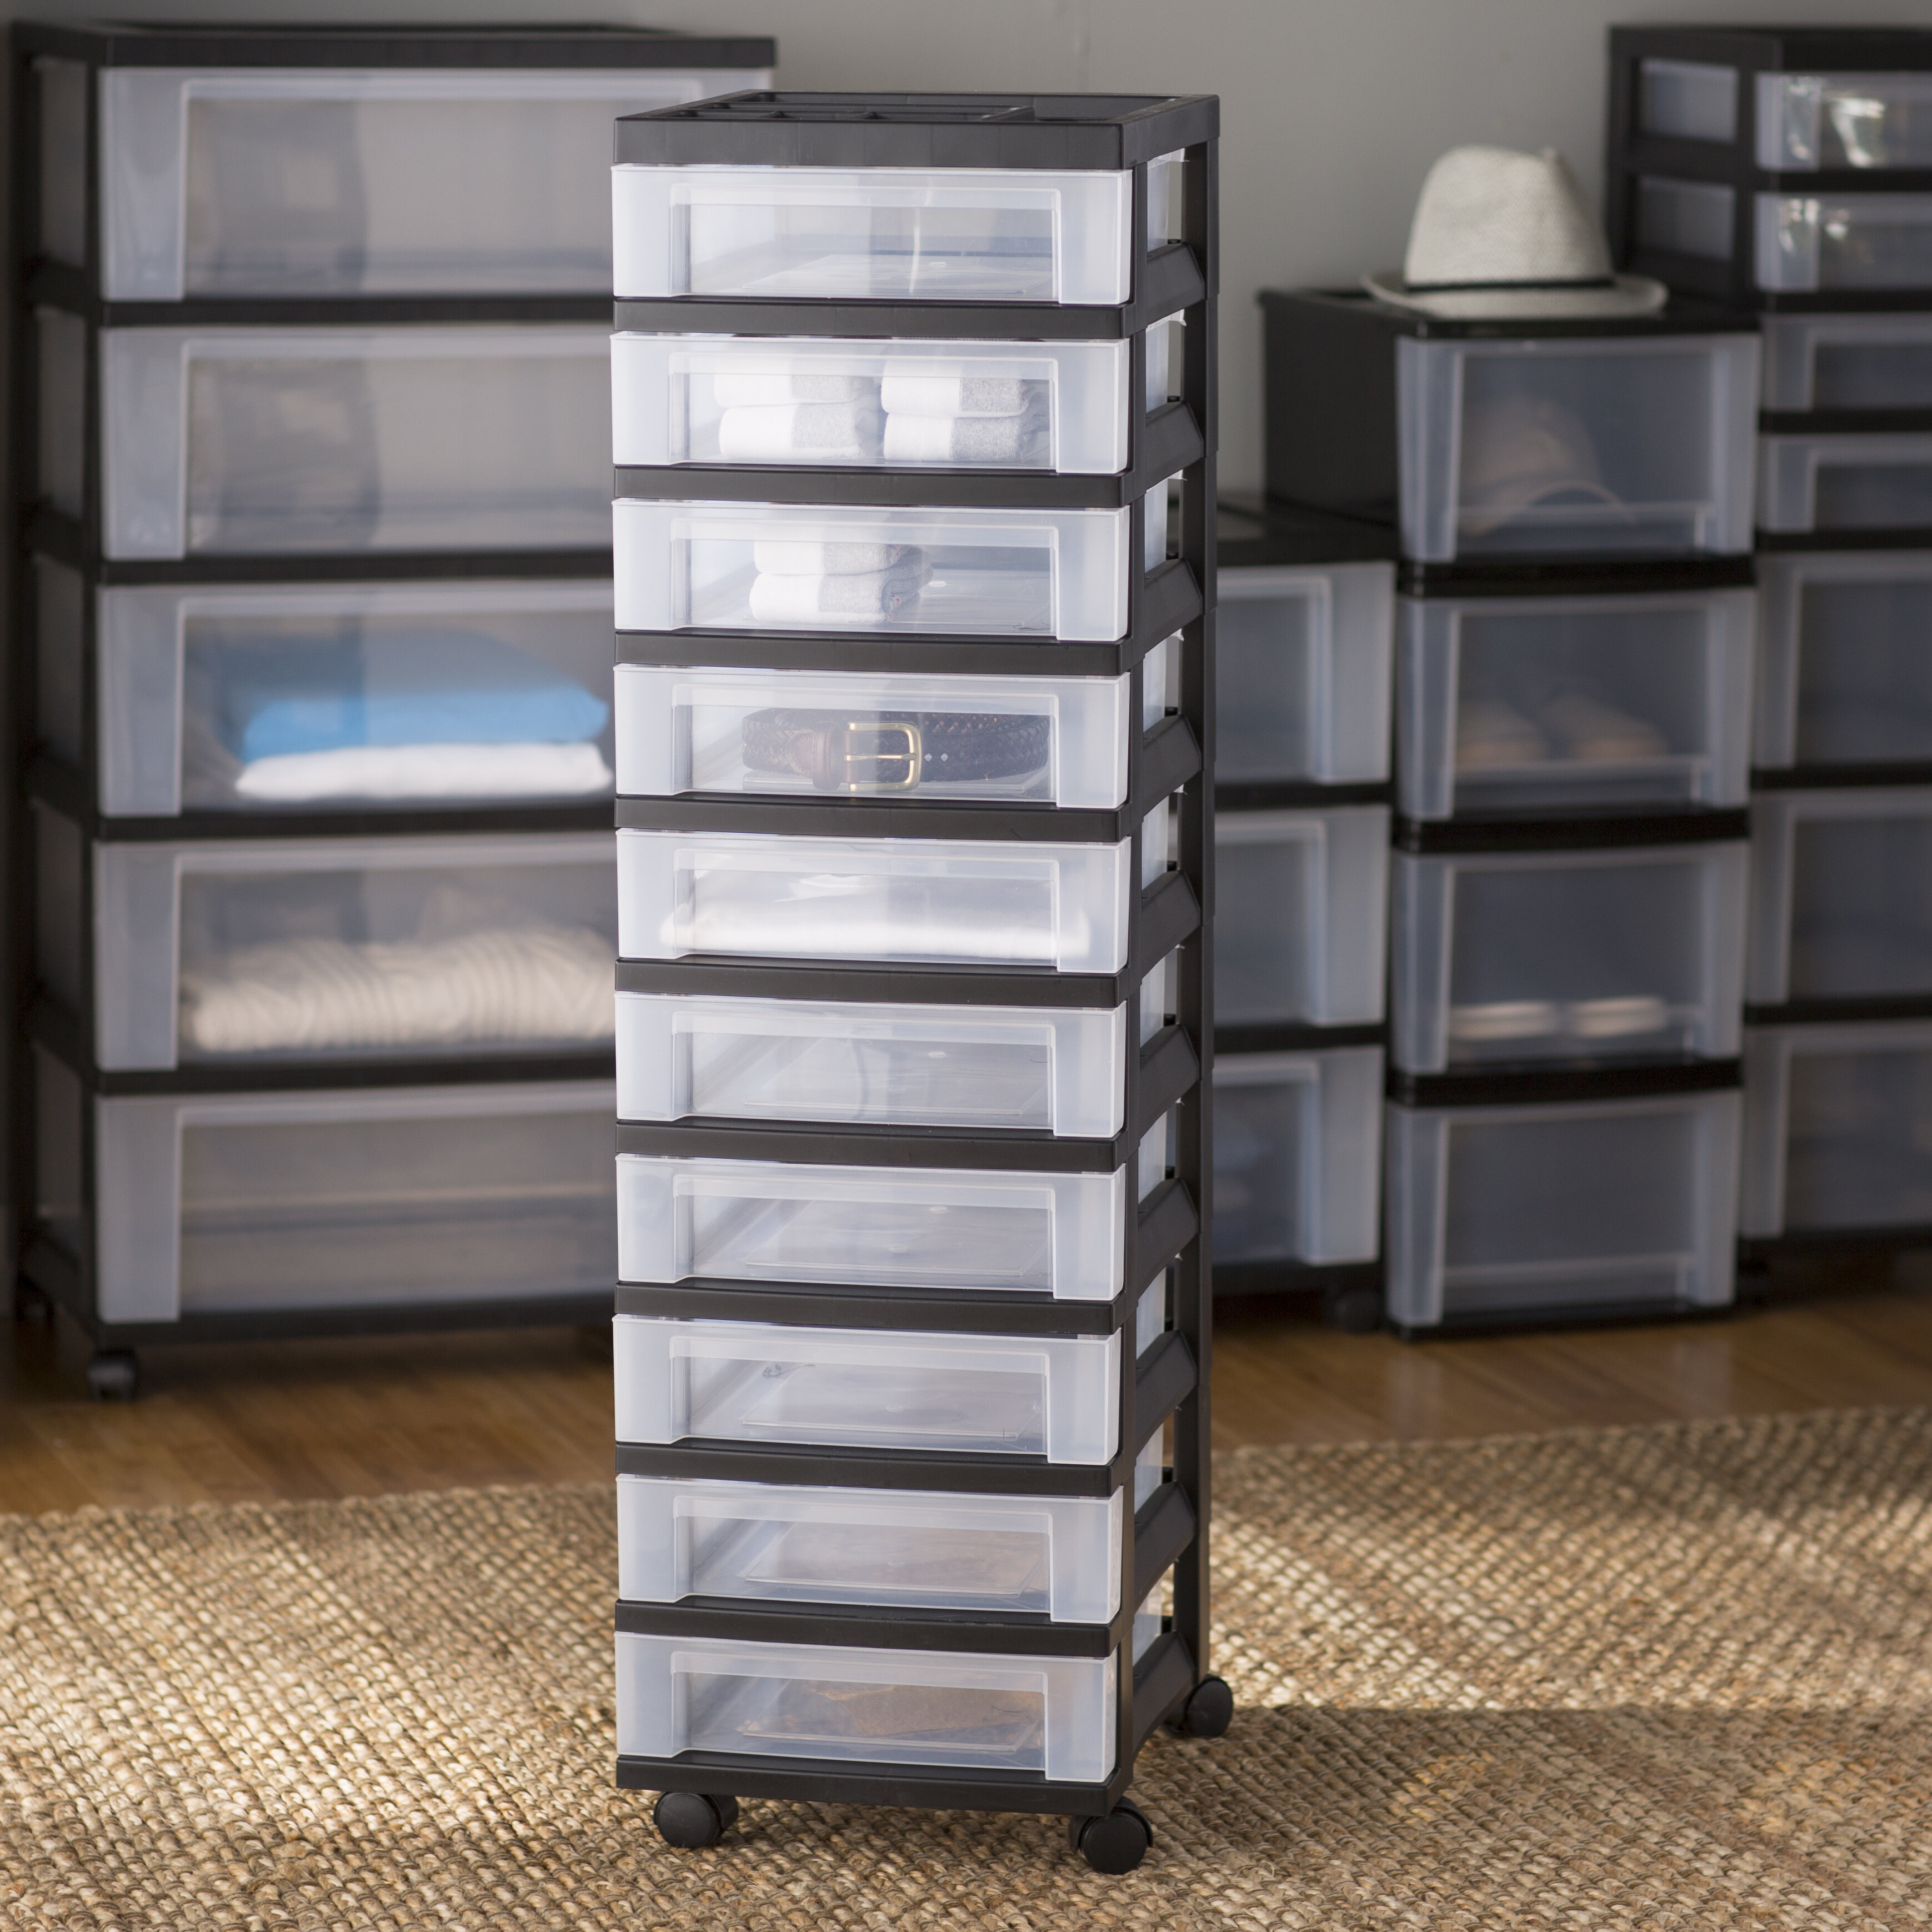 Zita Basics 10 Drawer Storage Chest